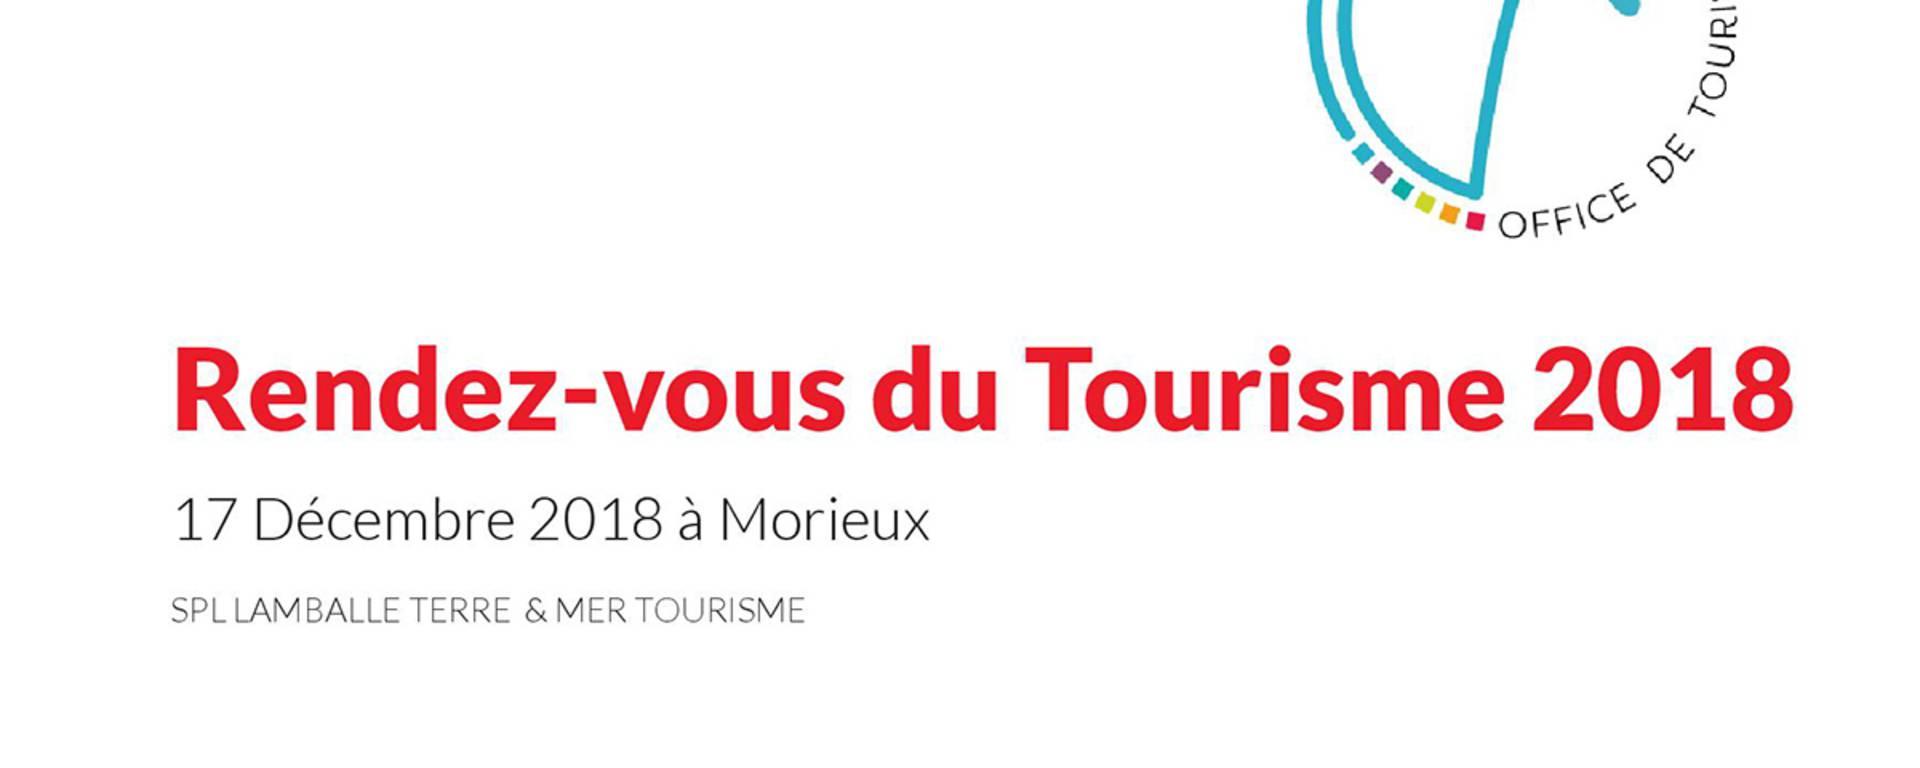 RDV-du-Tourisme